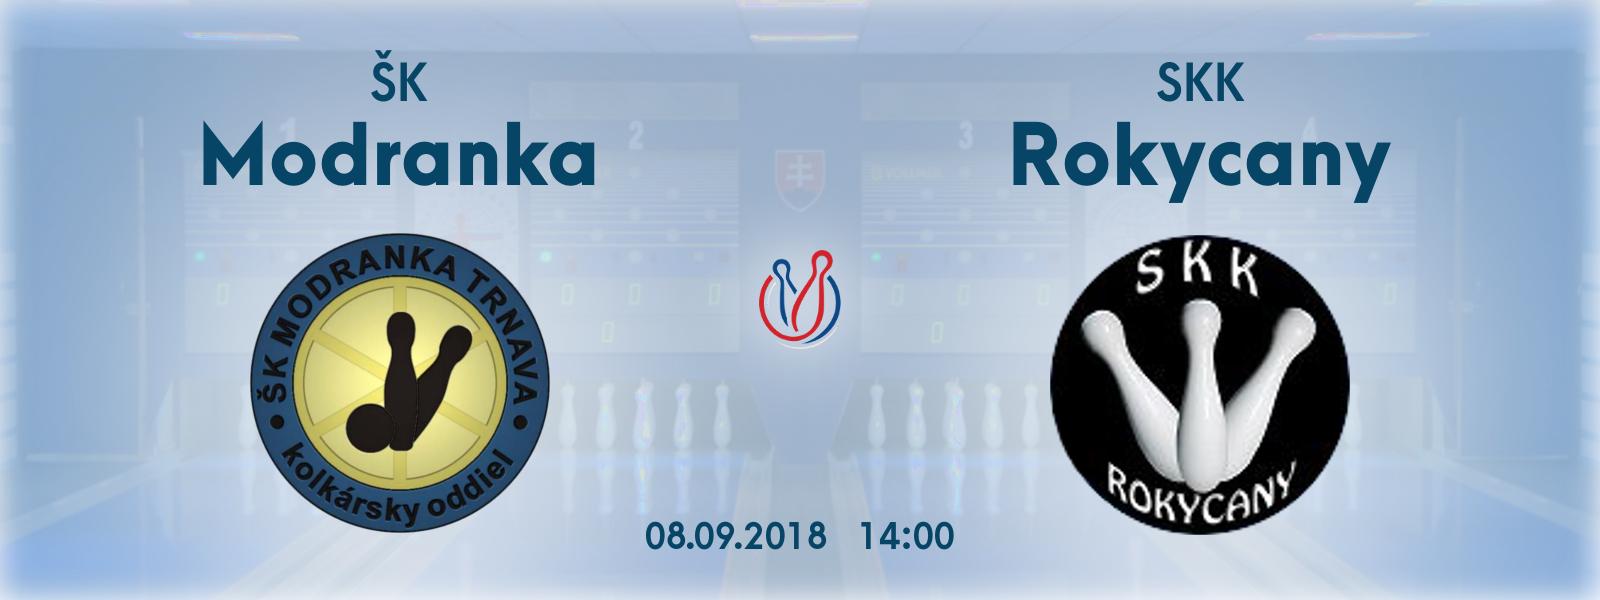 1 kolo interliga sk modranka skk rokycany kolky 2018 2019